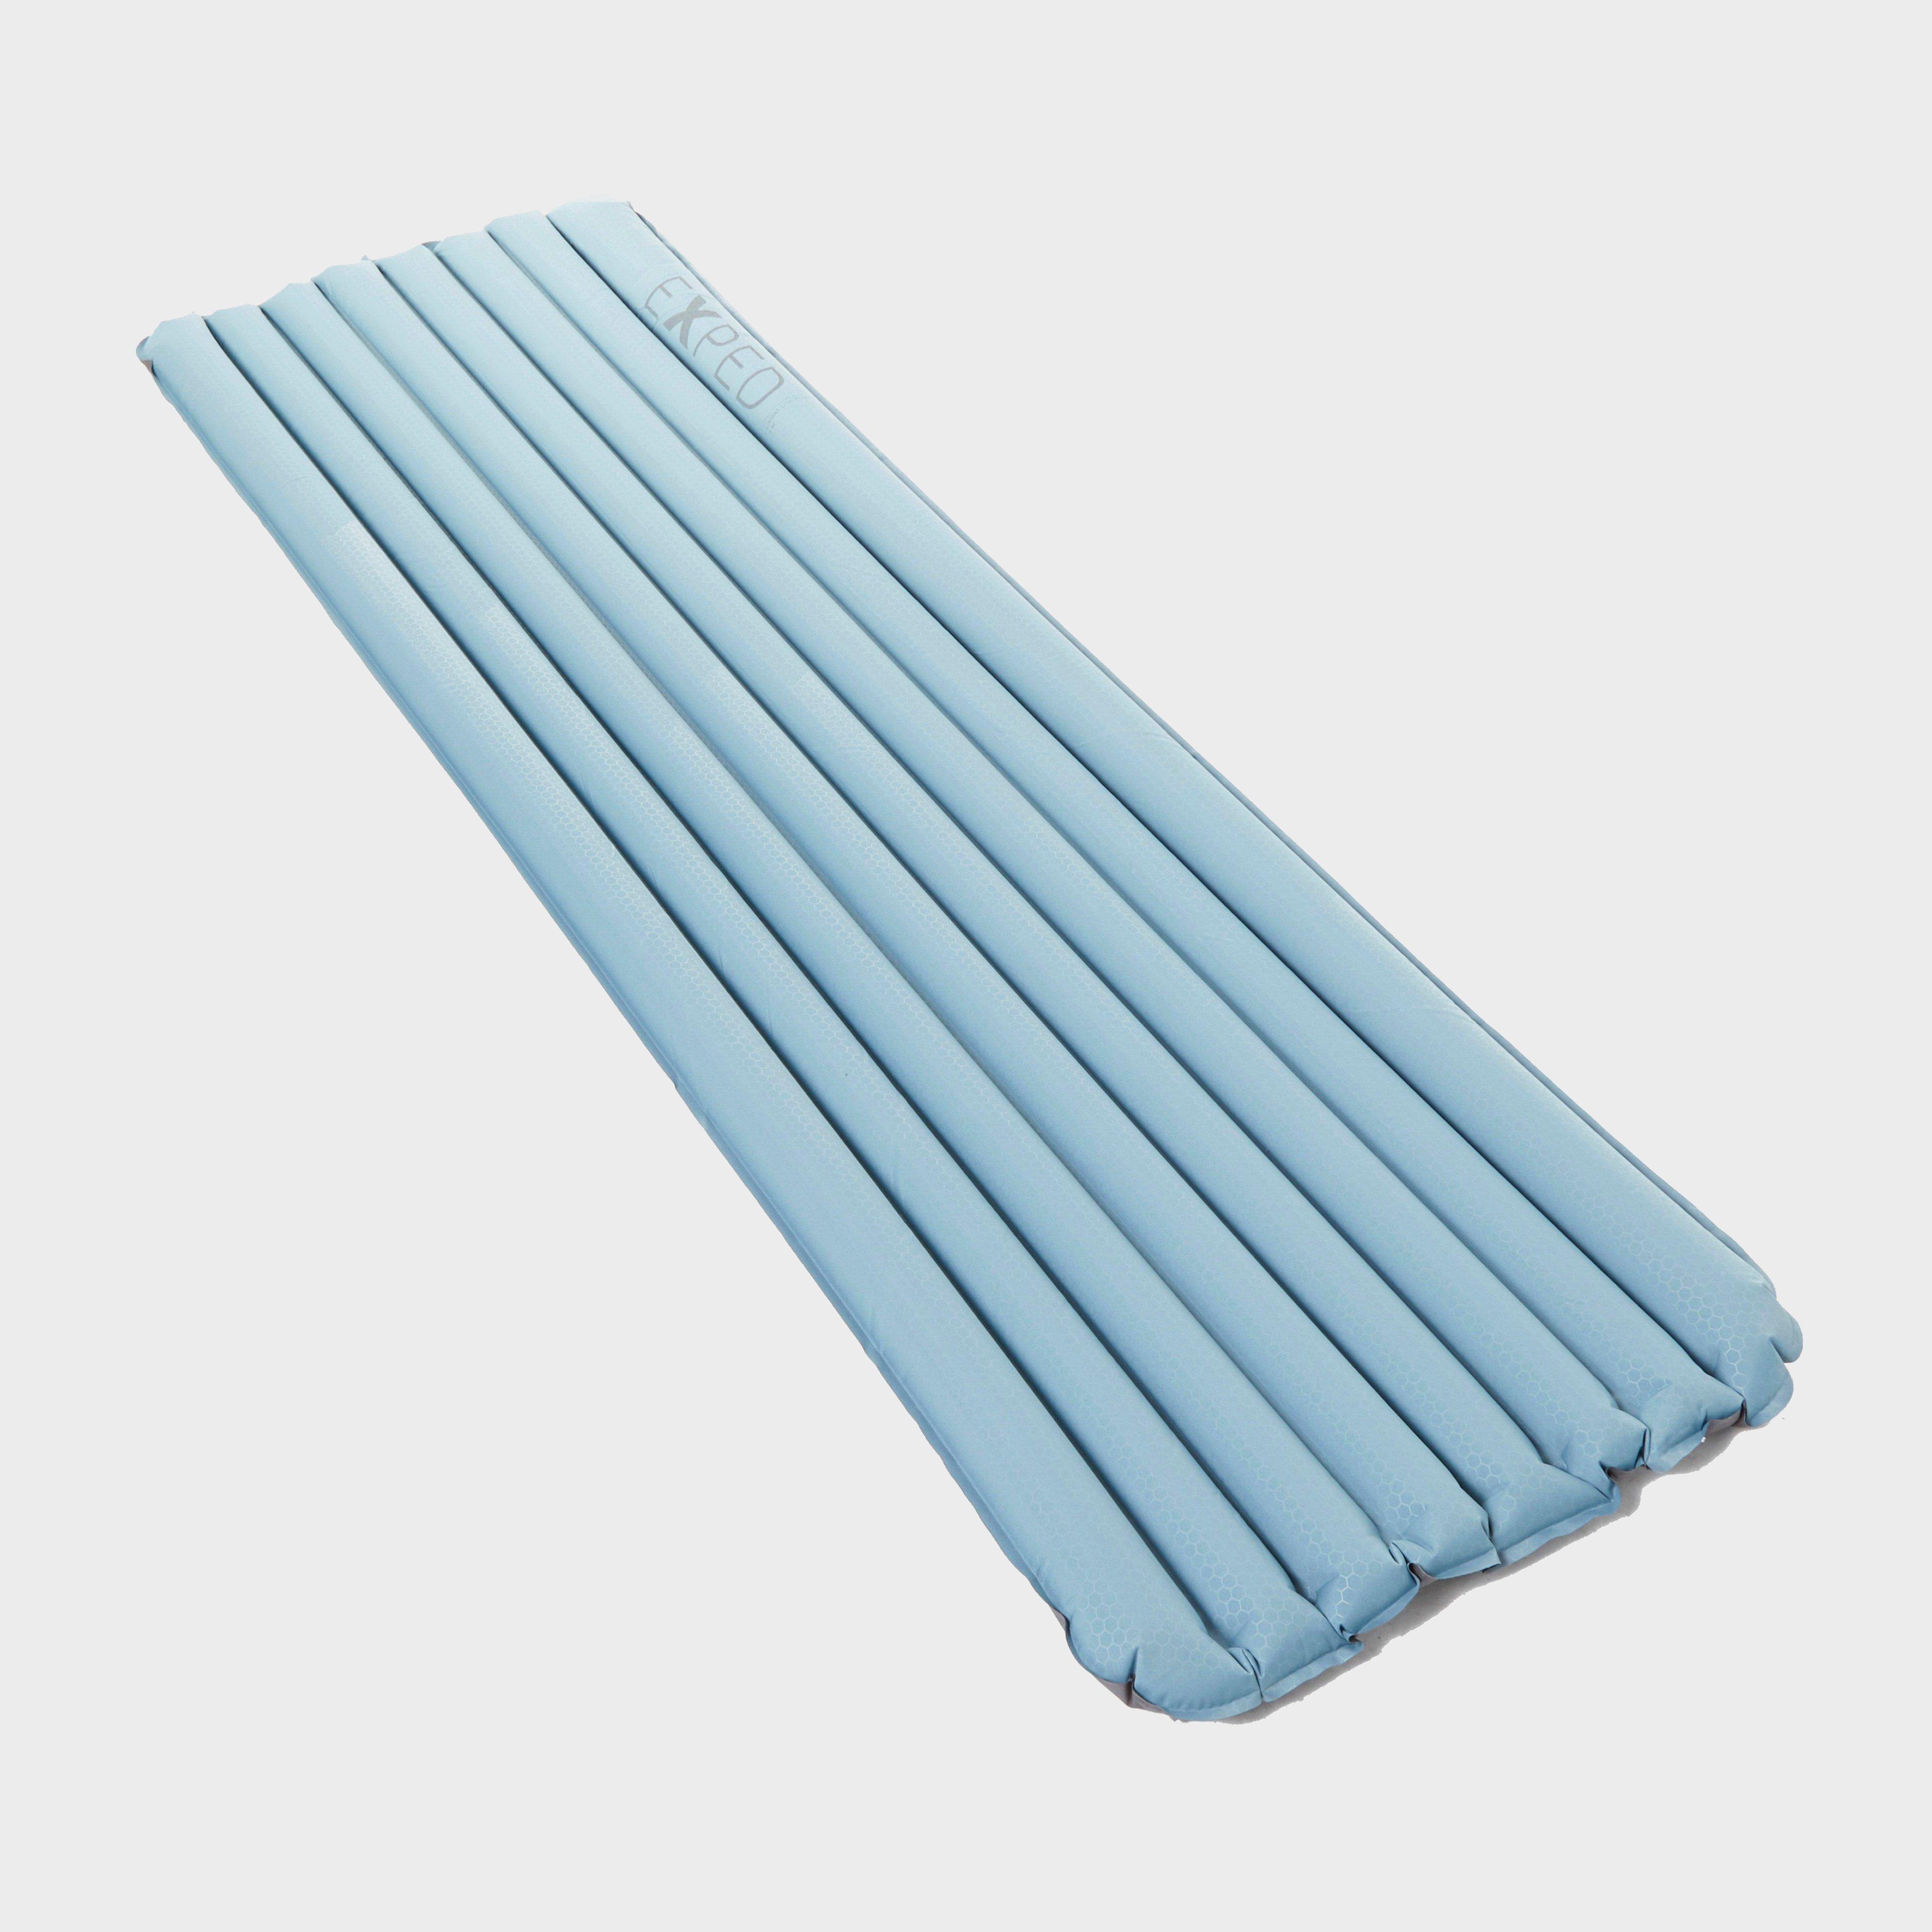 EXPED Airmat Lite Plus 5 Inflatable Sleeping Mat, Light Blue/Light Blue